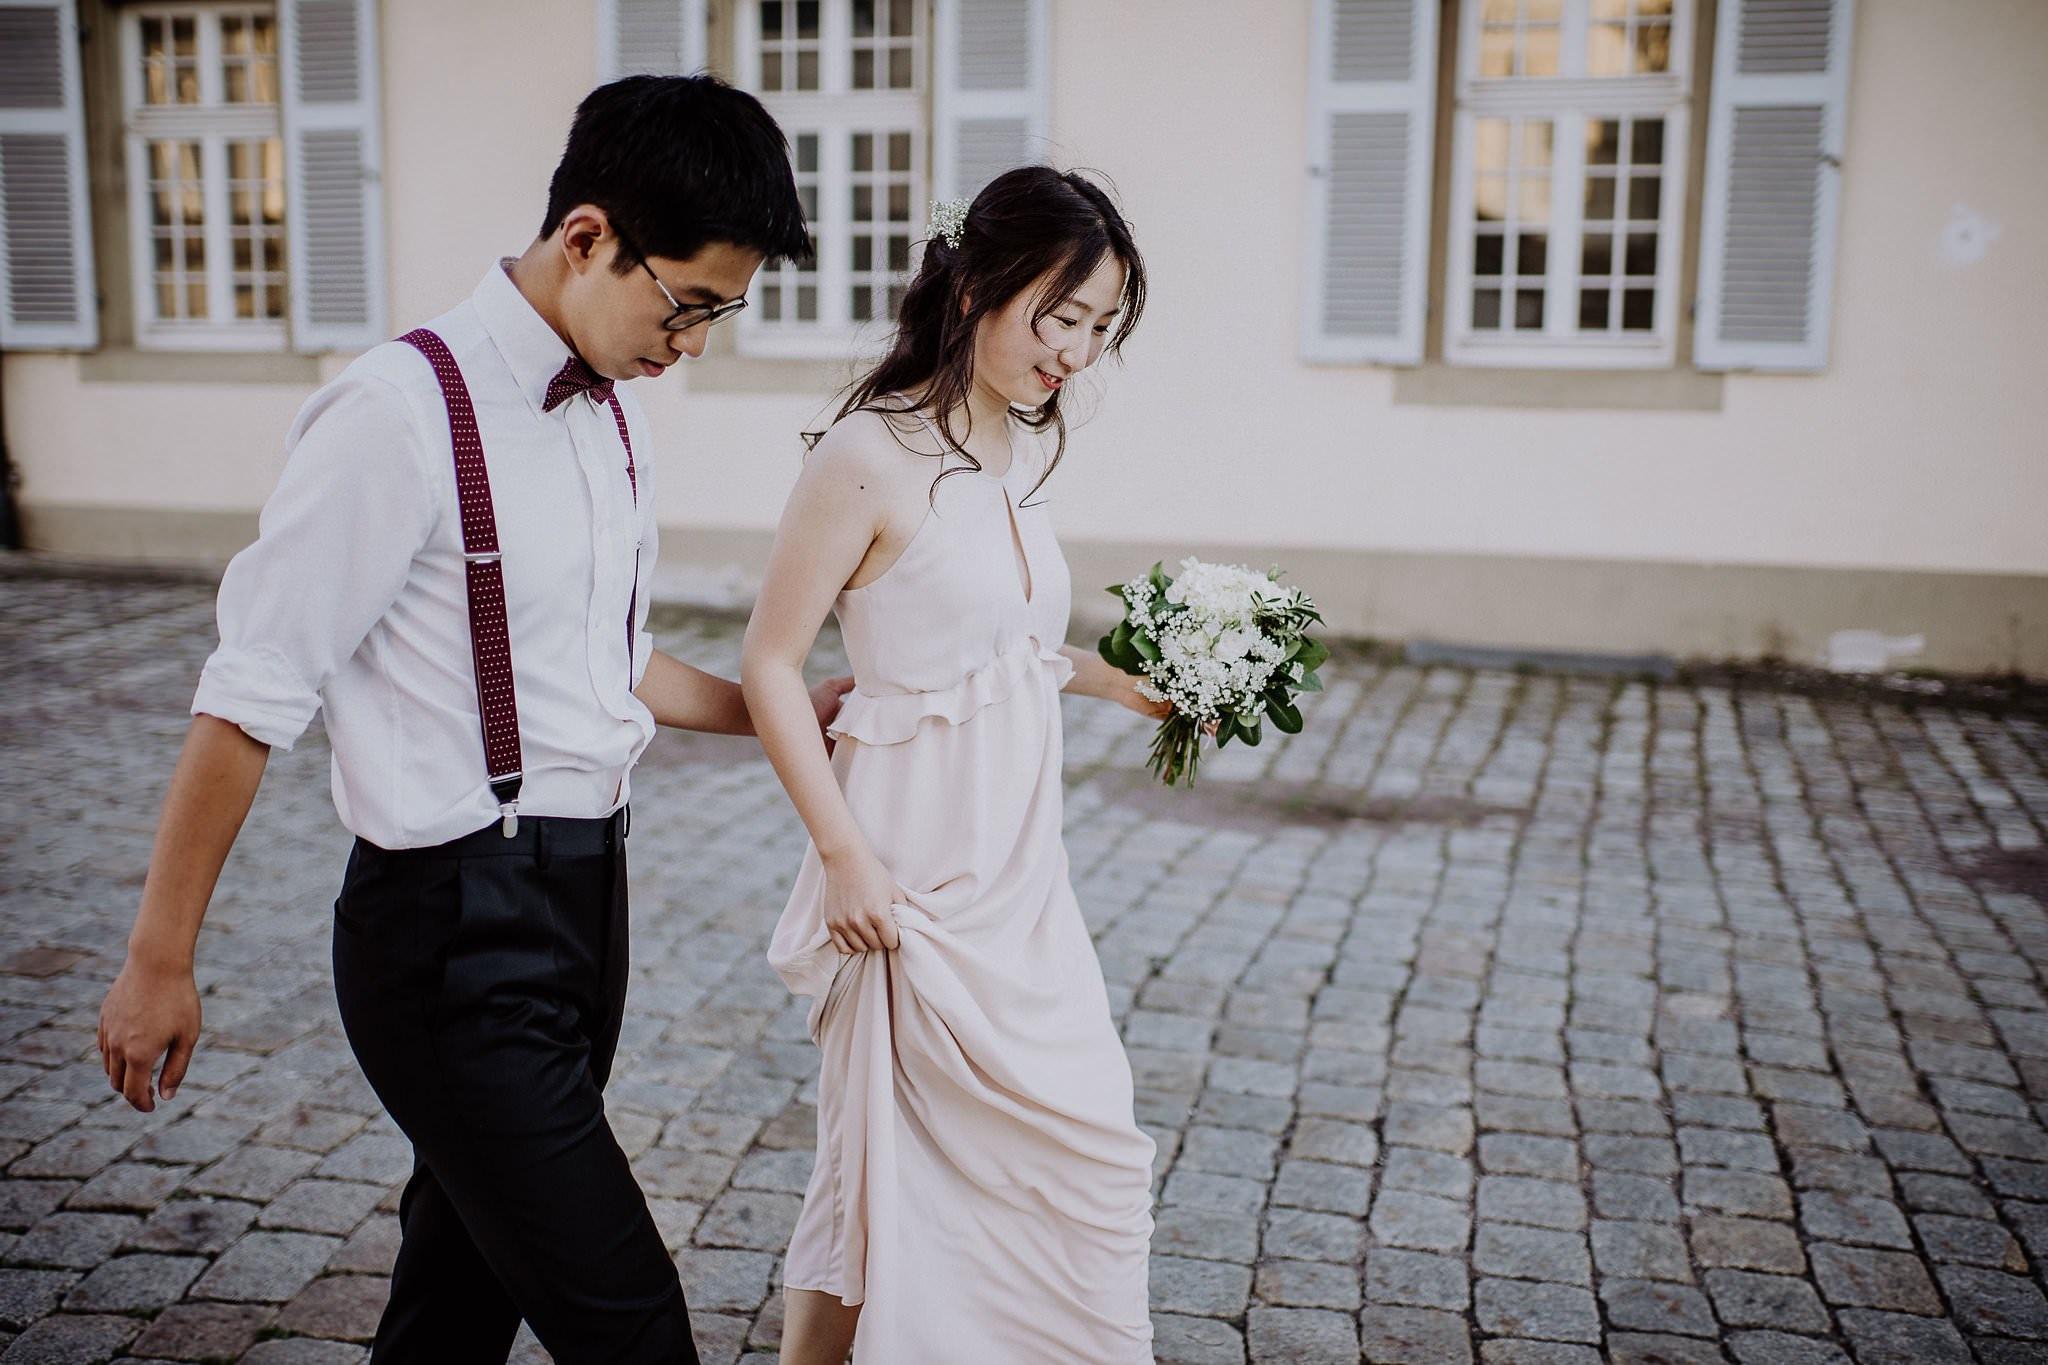 wedding photographer hamilton new zealand 1010 6